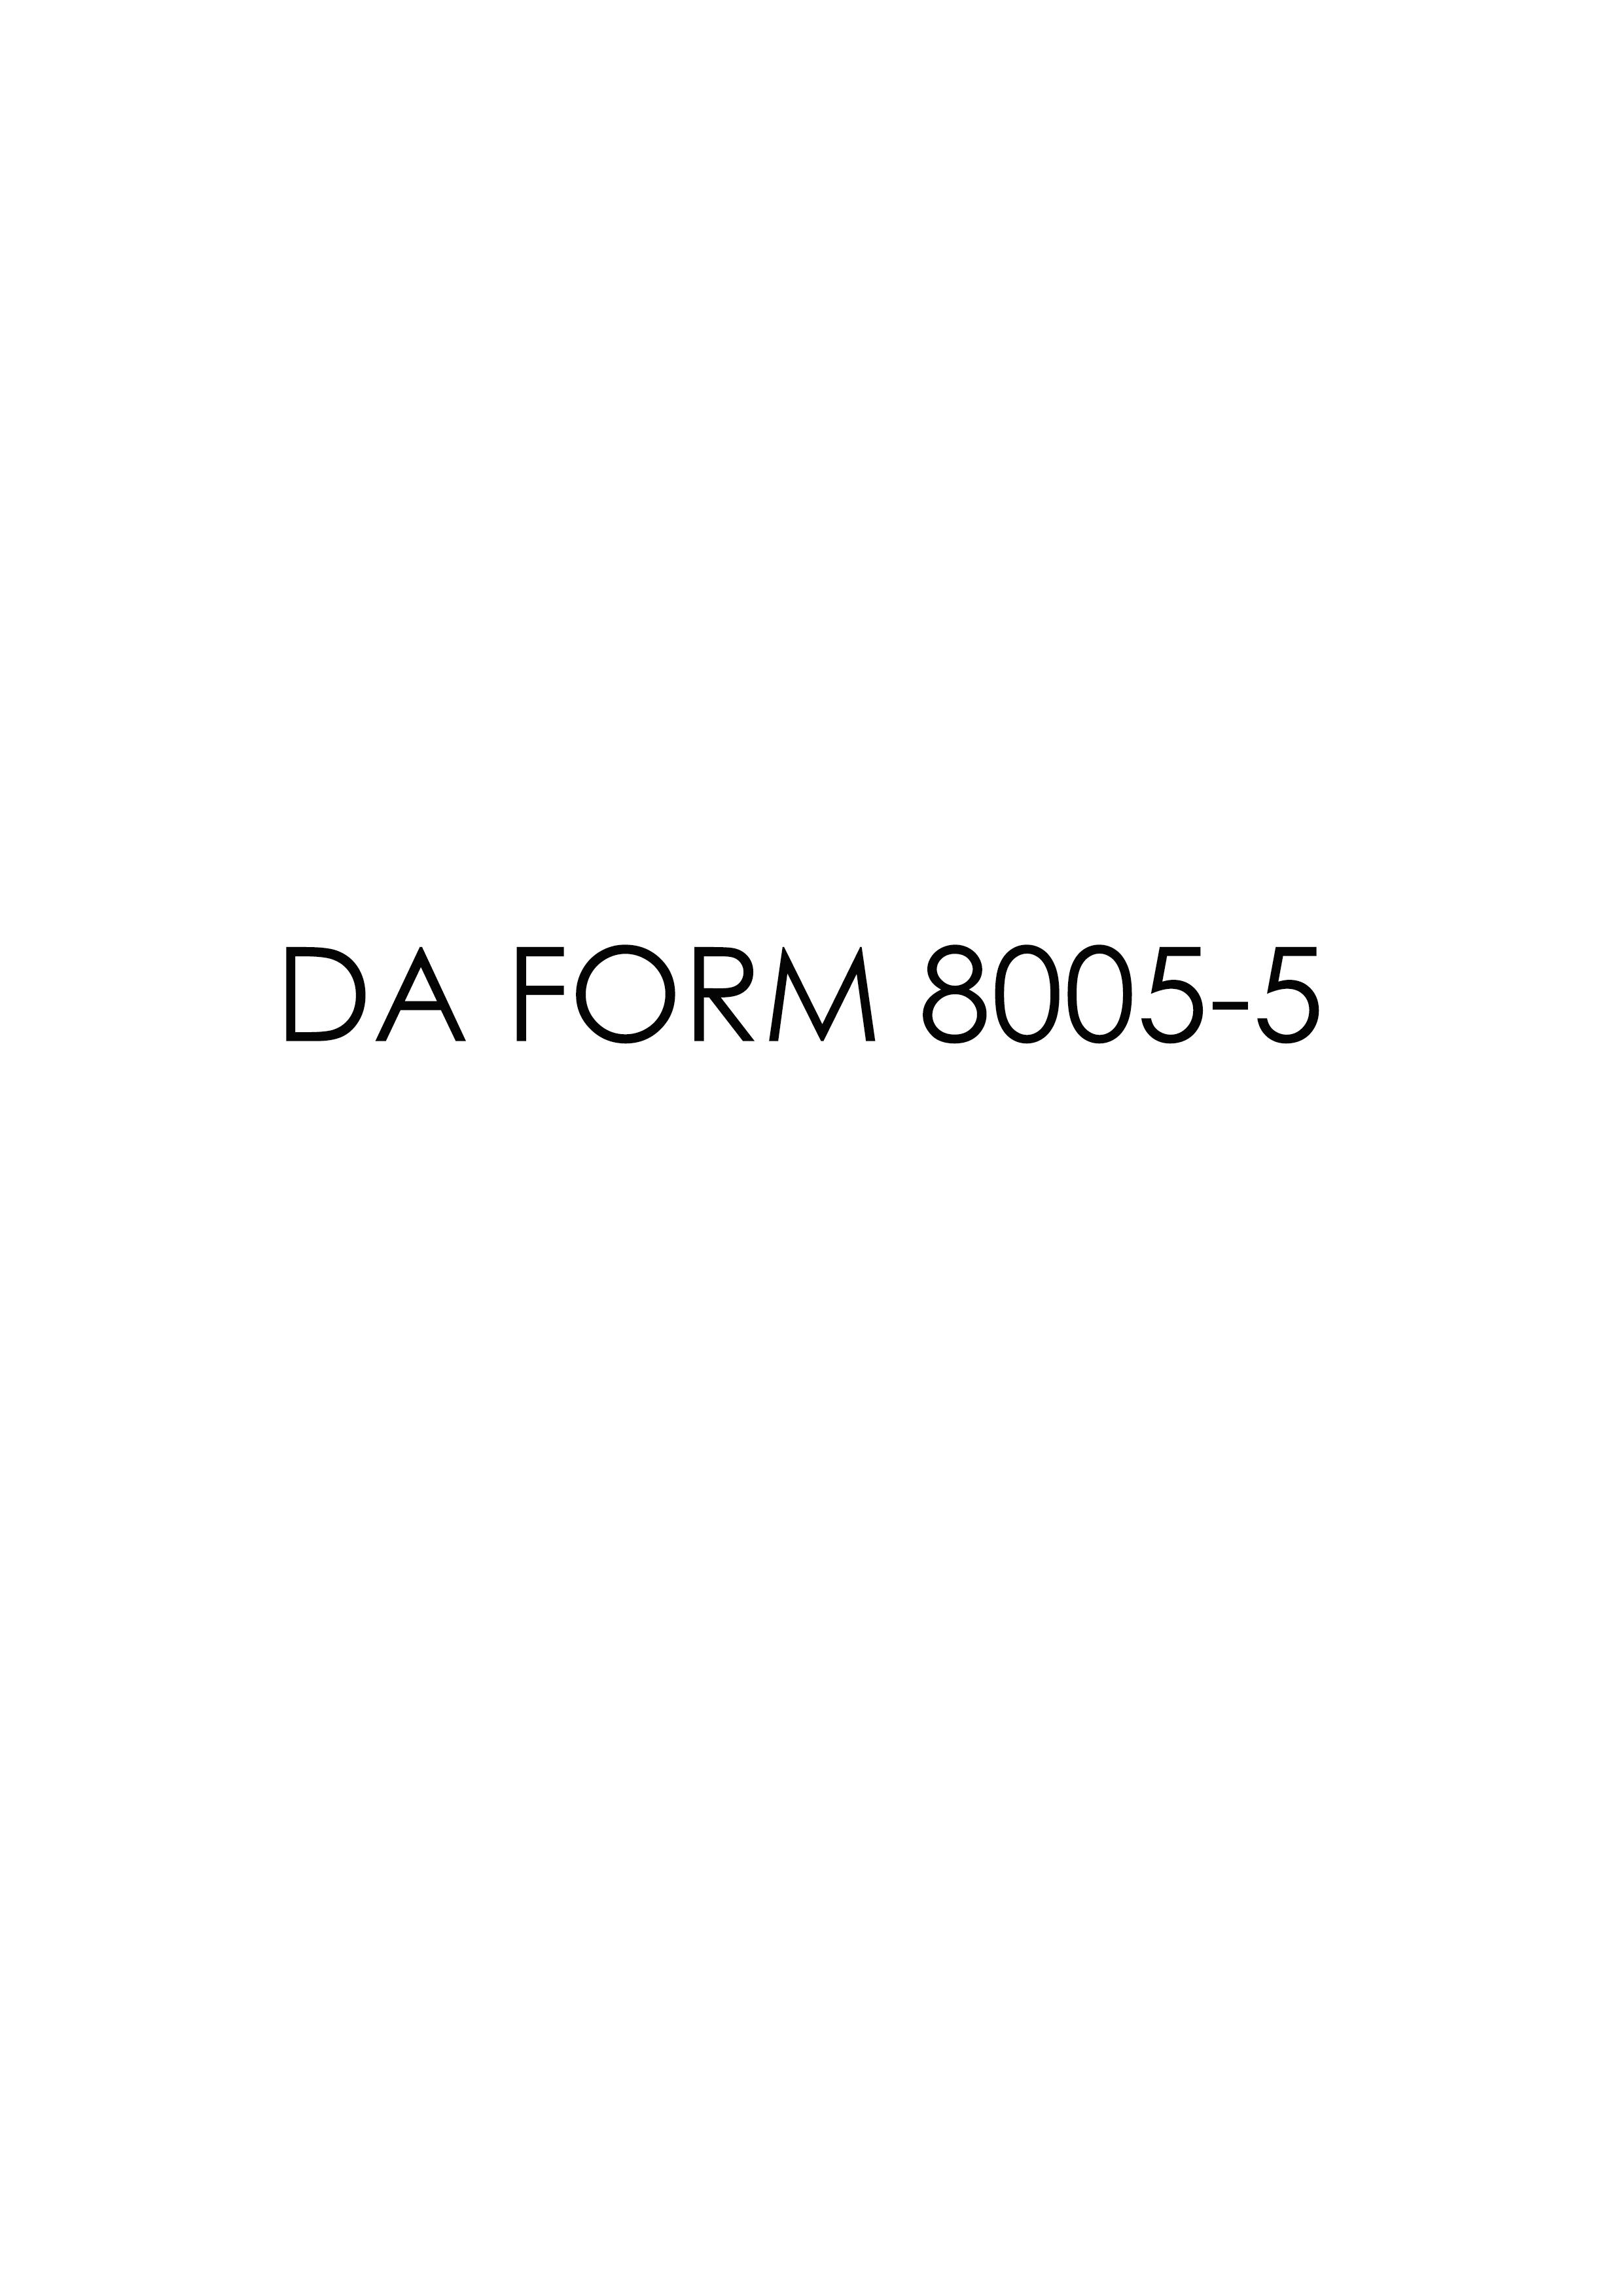 Download da Form 8005-5 Free